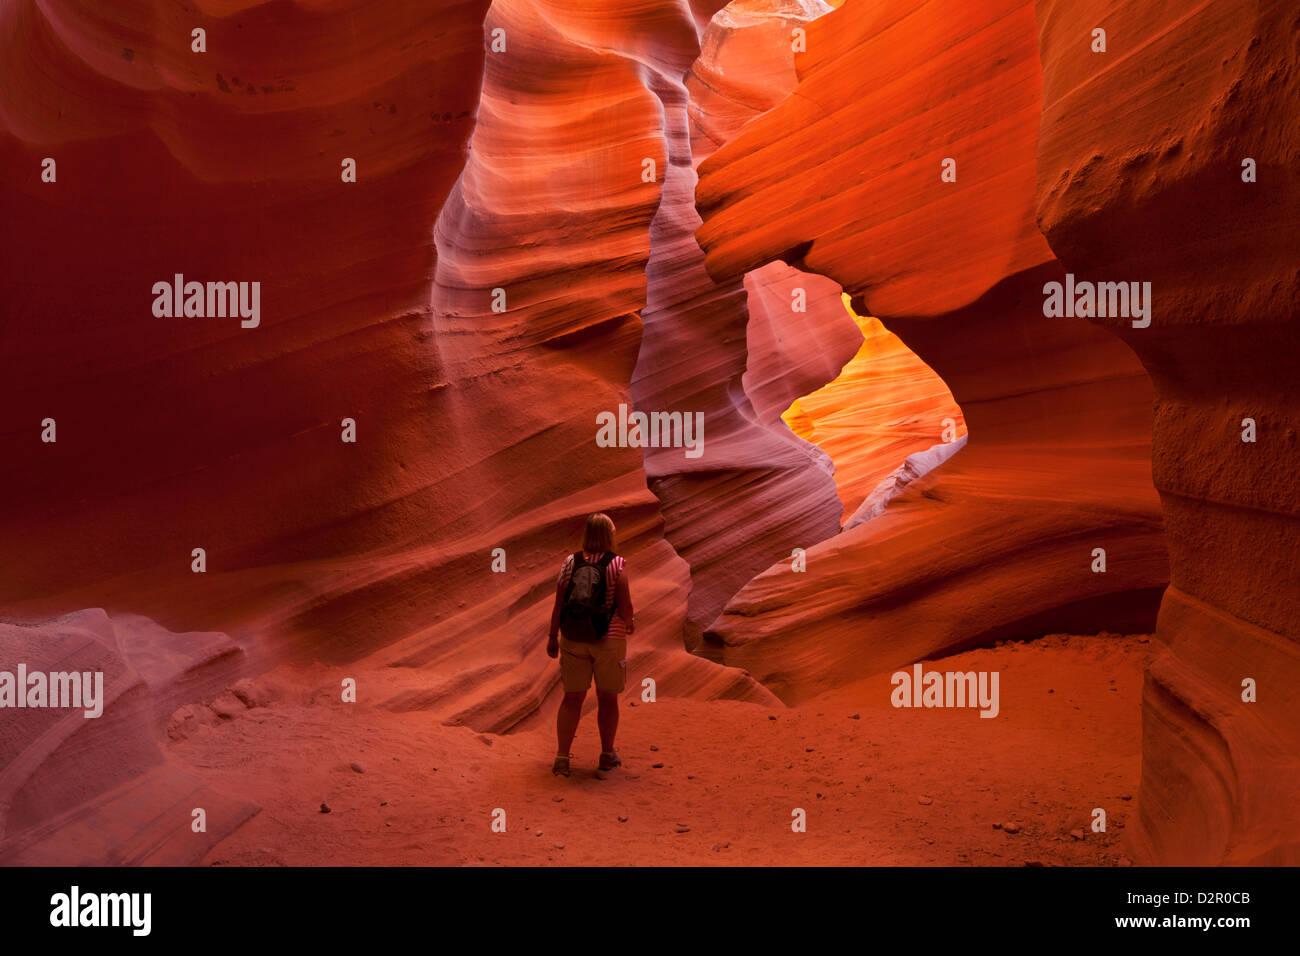 Woman randonneur et formations de roche de grès, Lower Antelope Canyon, Page, Arizona, USA Photo Stock